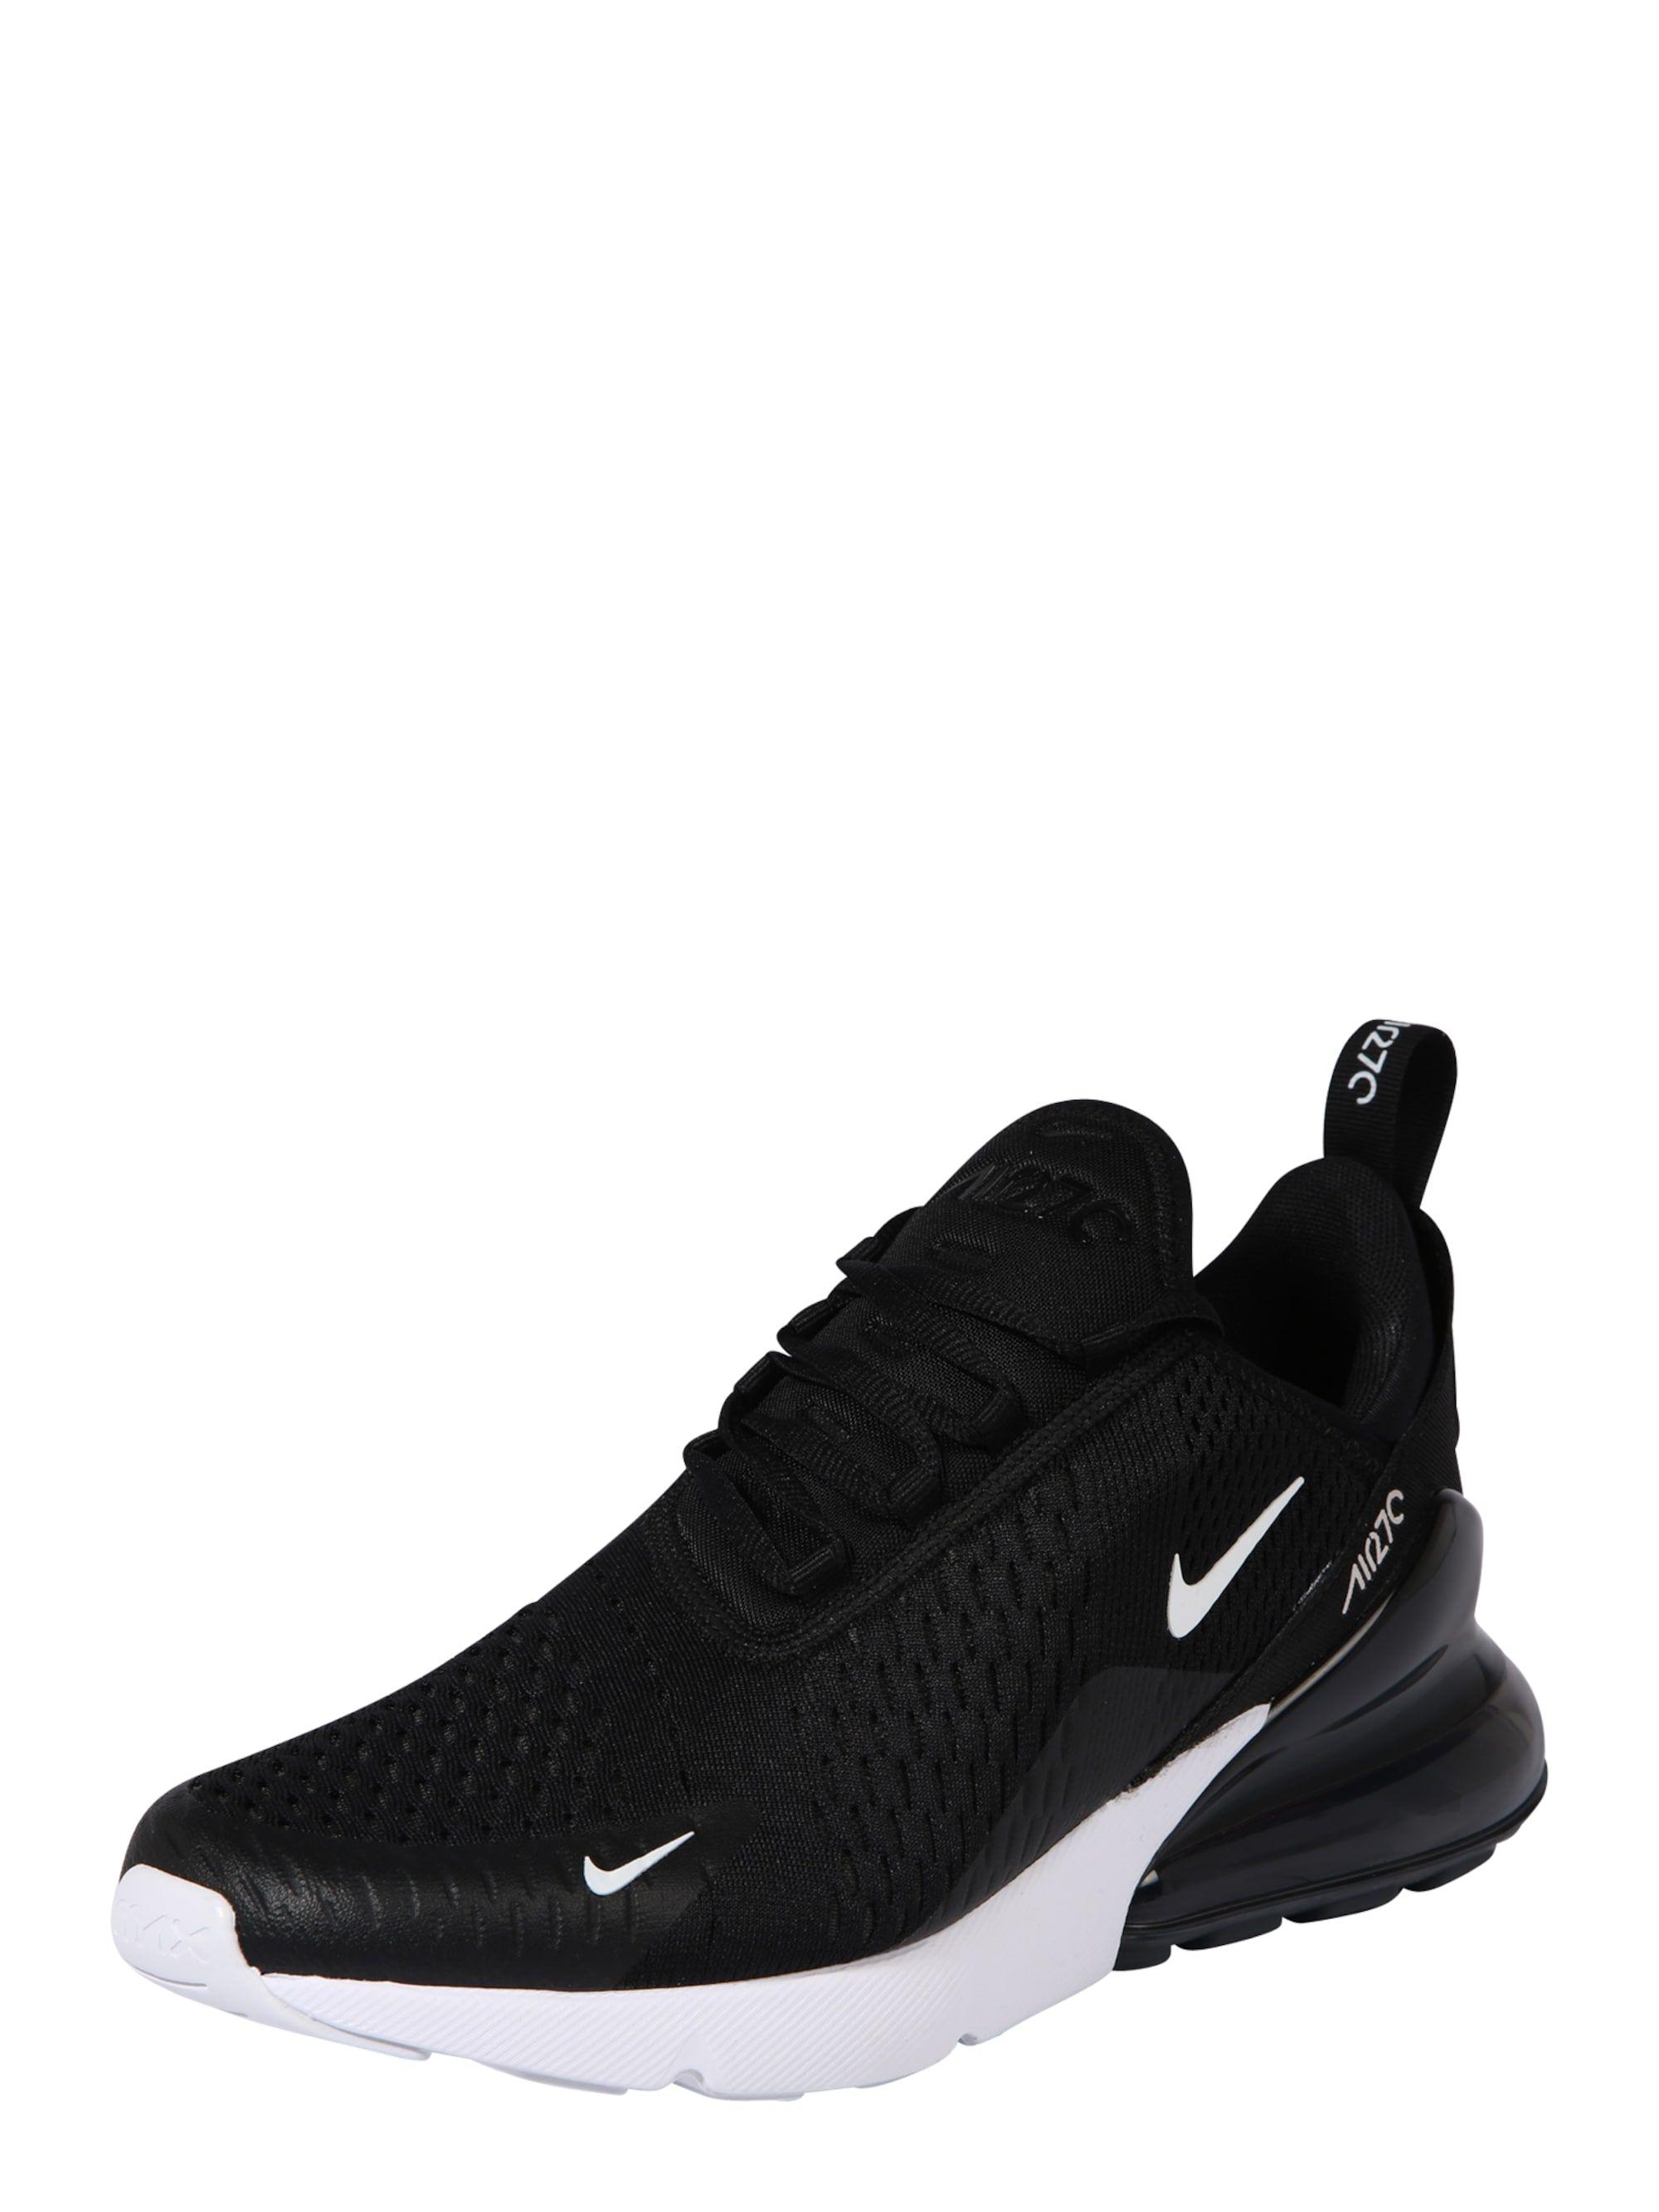 Herren Nike Sportswear Air Max 270 Sneaker Schwarz Kategorie Herren Schuhesneakersneaker Lowsneaker Material Mesh Material With Images Sneakers Nike Nike Sportswear